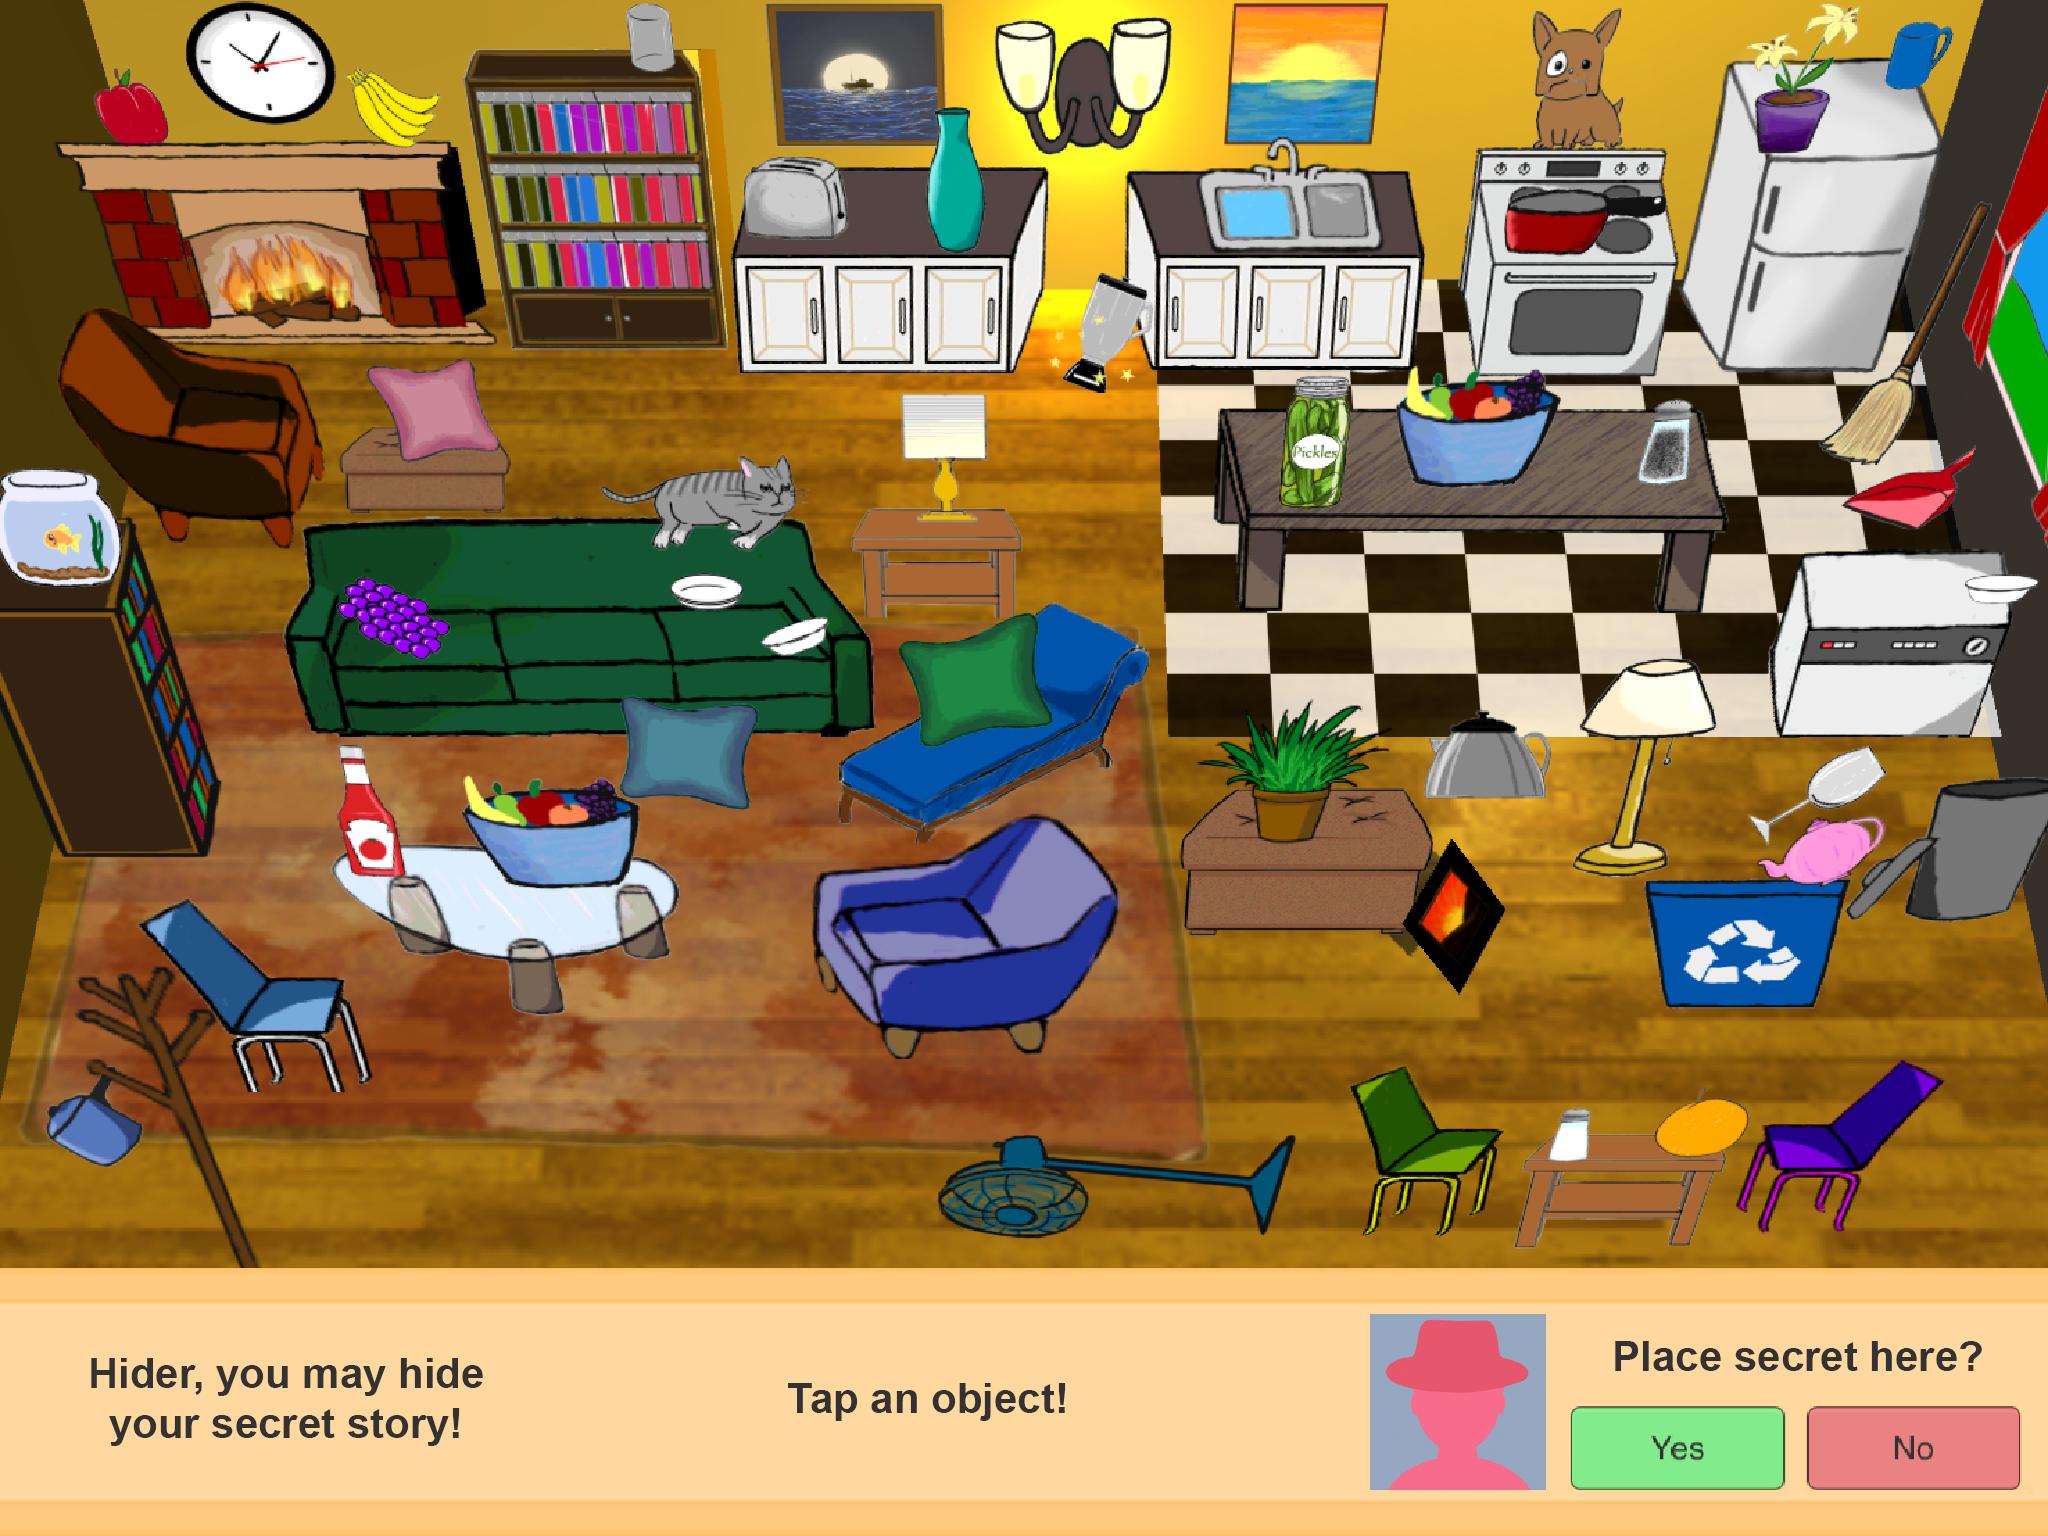 SecretStory_Image3_GameScene.png